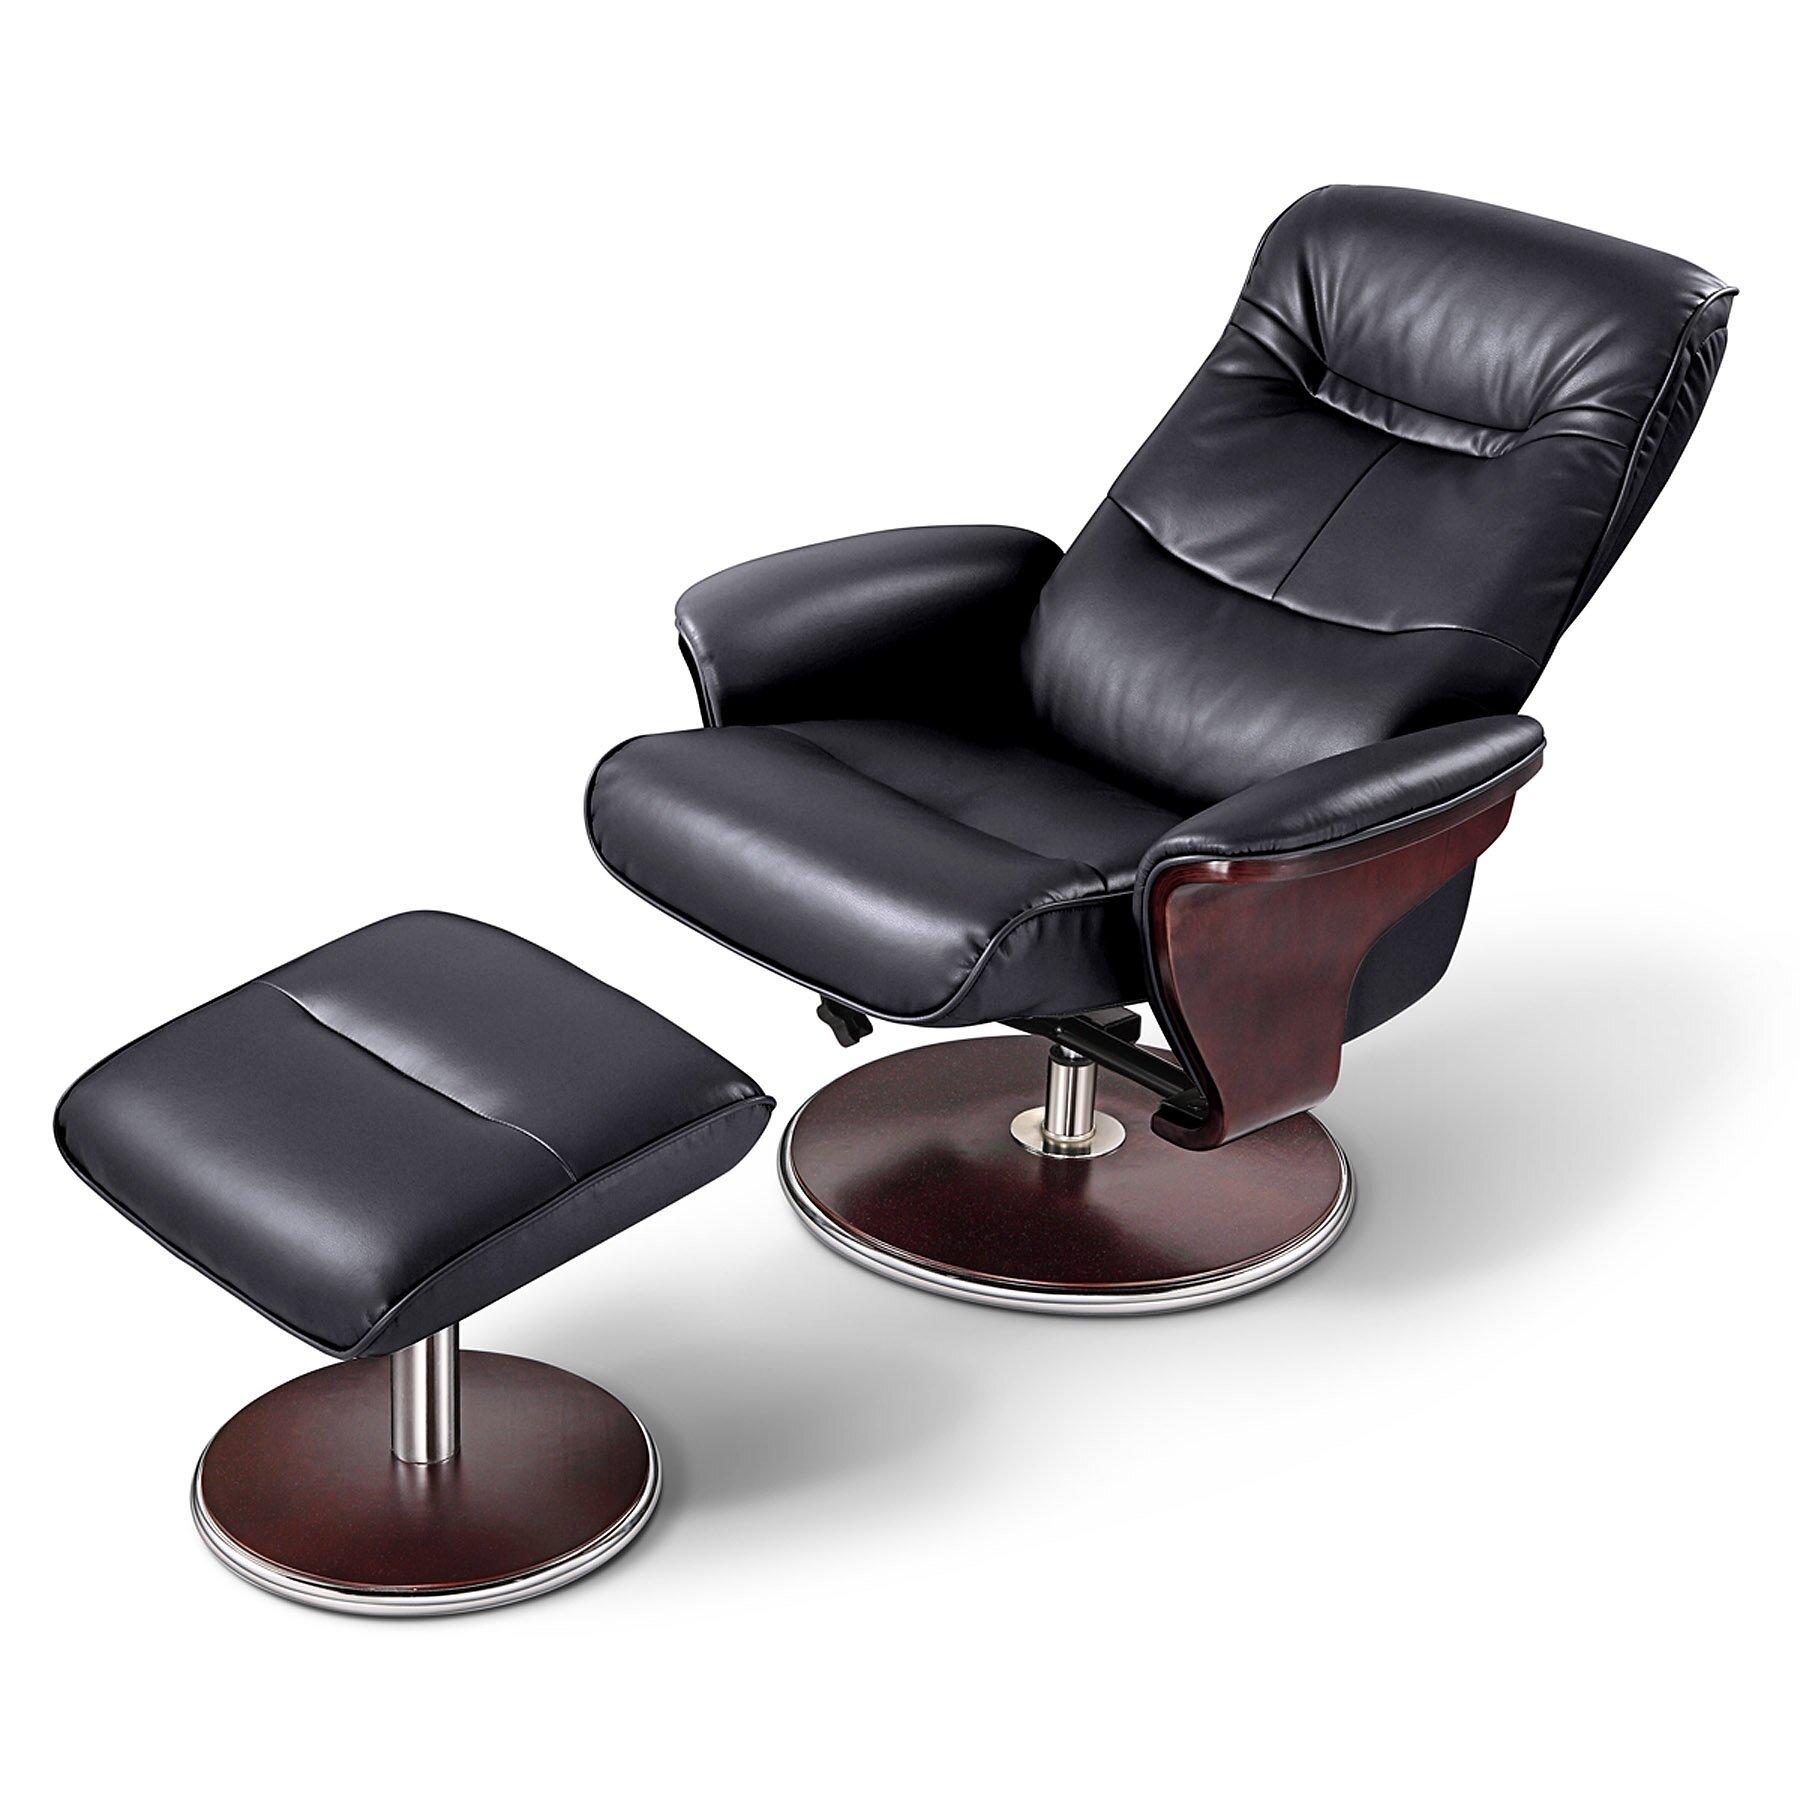 Milano Leather Recliner Sofa: Artiva USA Milano Leather Swivel Recliner And Ottoman